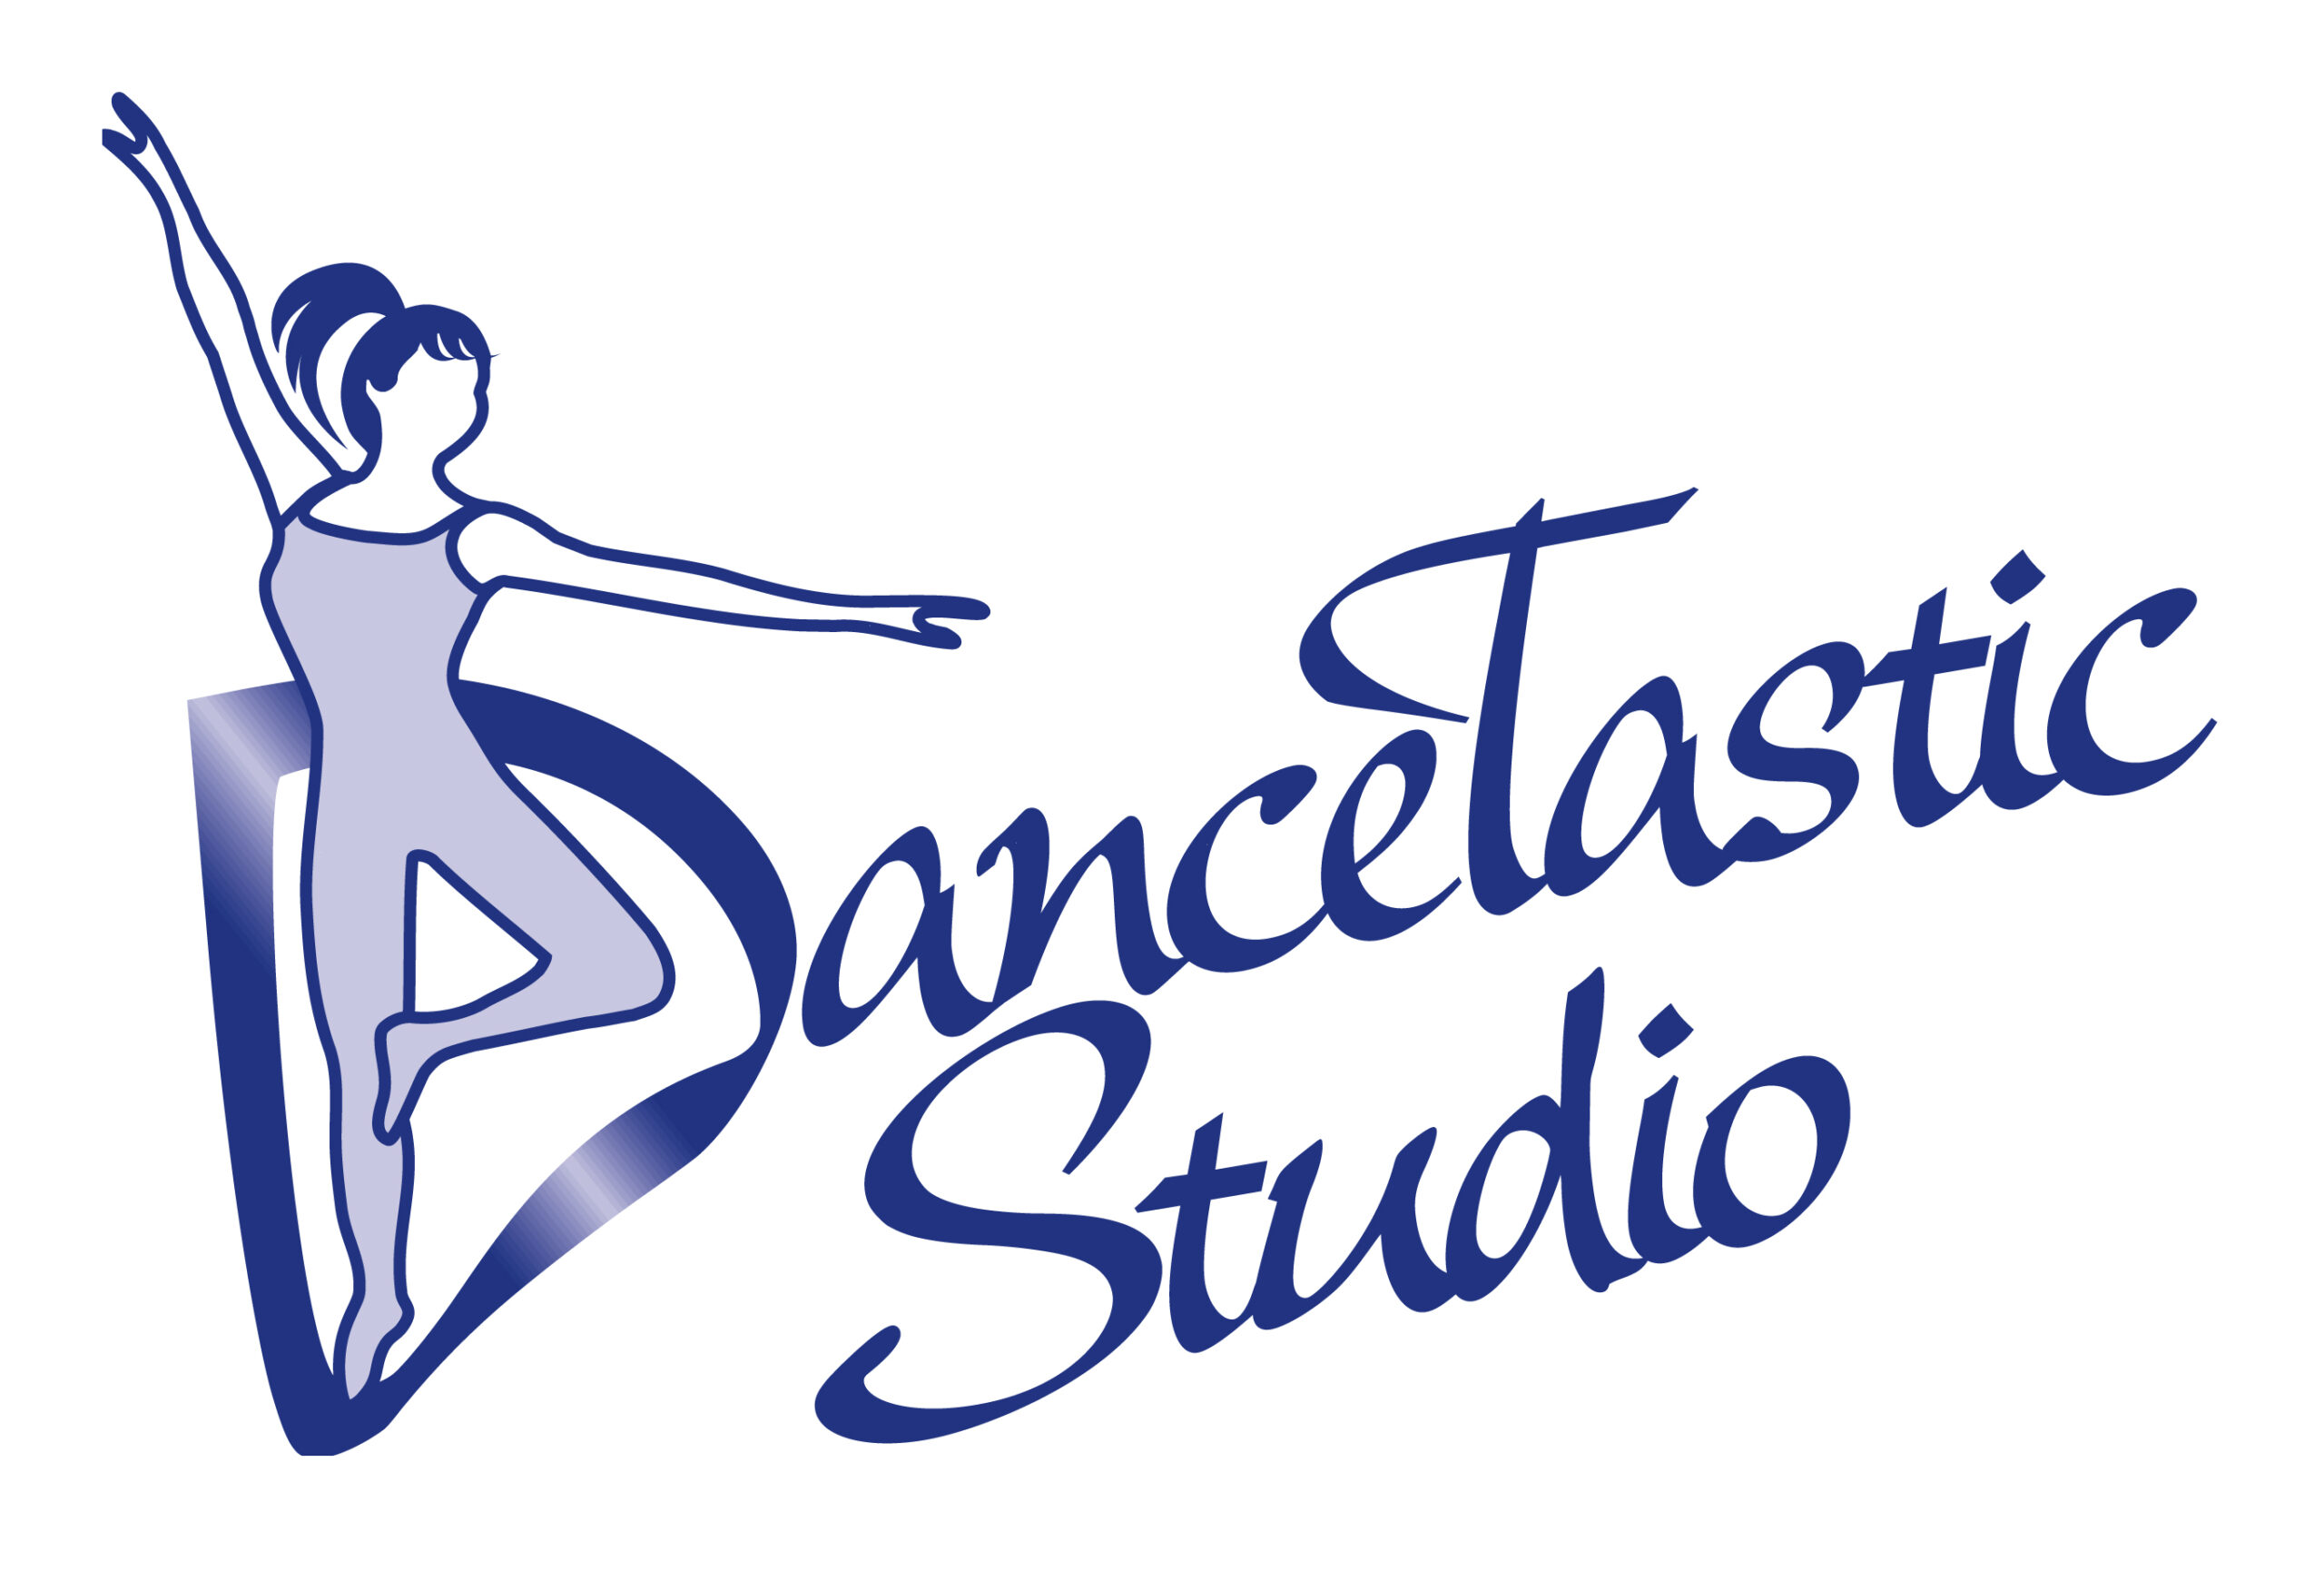 DanceTastic Studios Inc.